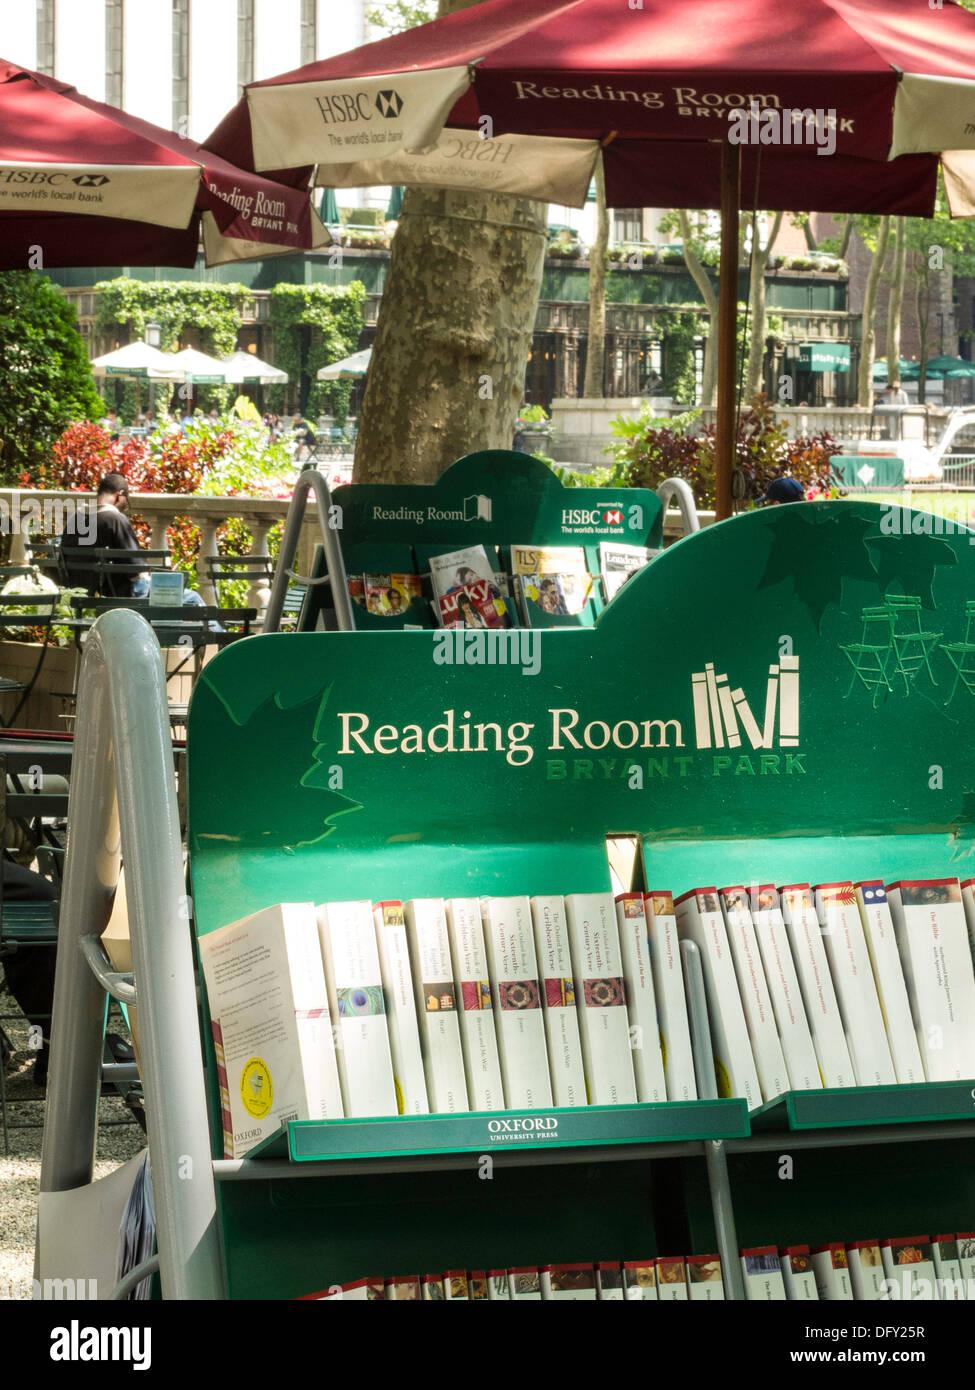 Outdoor Reading Room, NYPL, Bryant Park, NYC Stock Photo